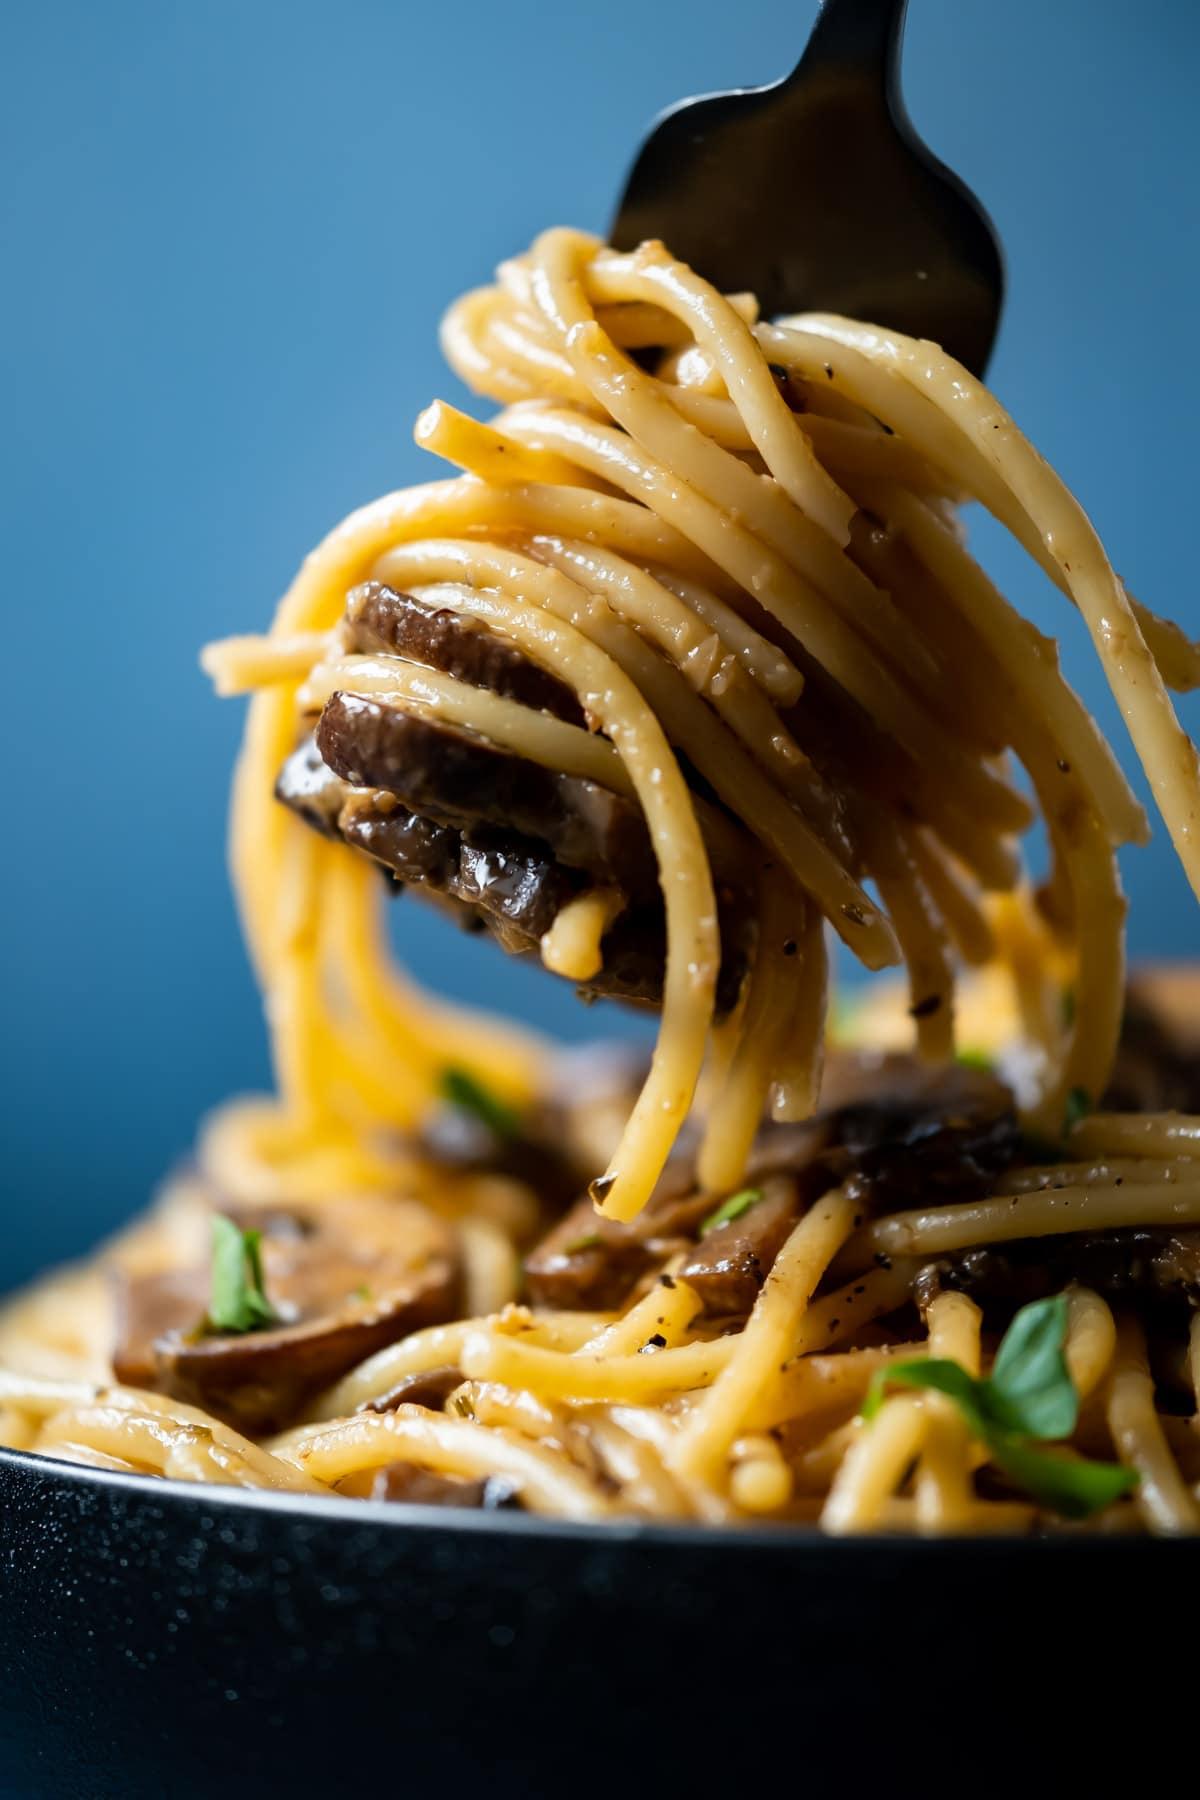 Forkful of mushroom pasta.